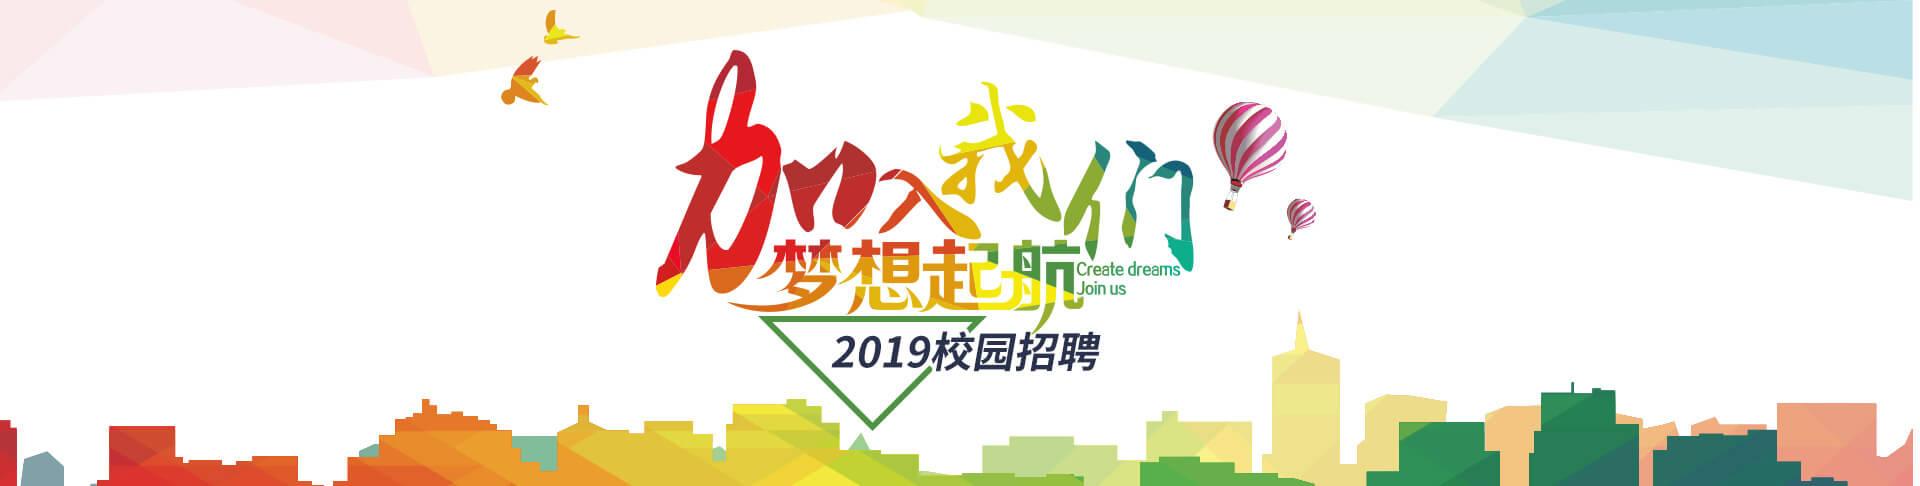 �V西南��泳涵洋鑫房地�a投�Y有限公司logo